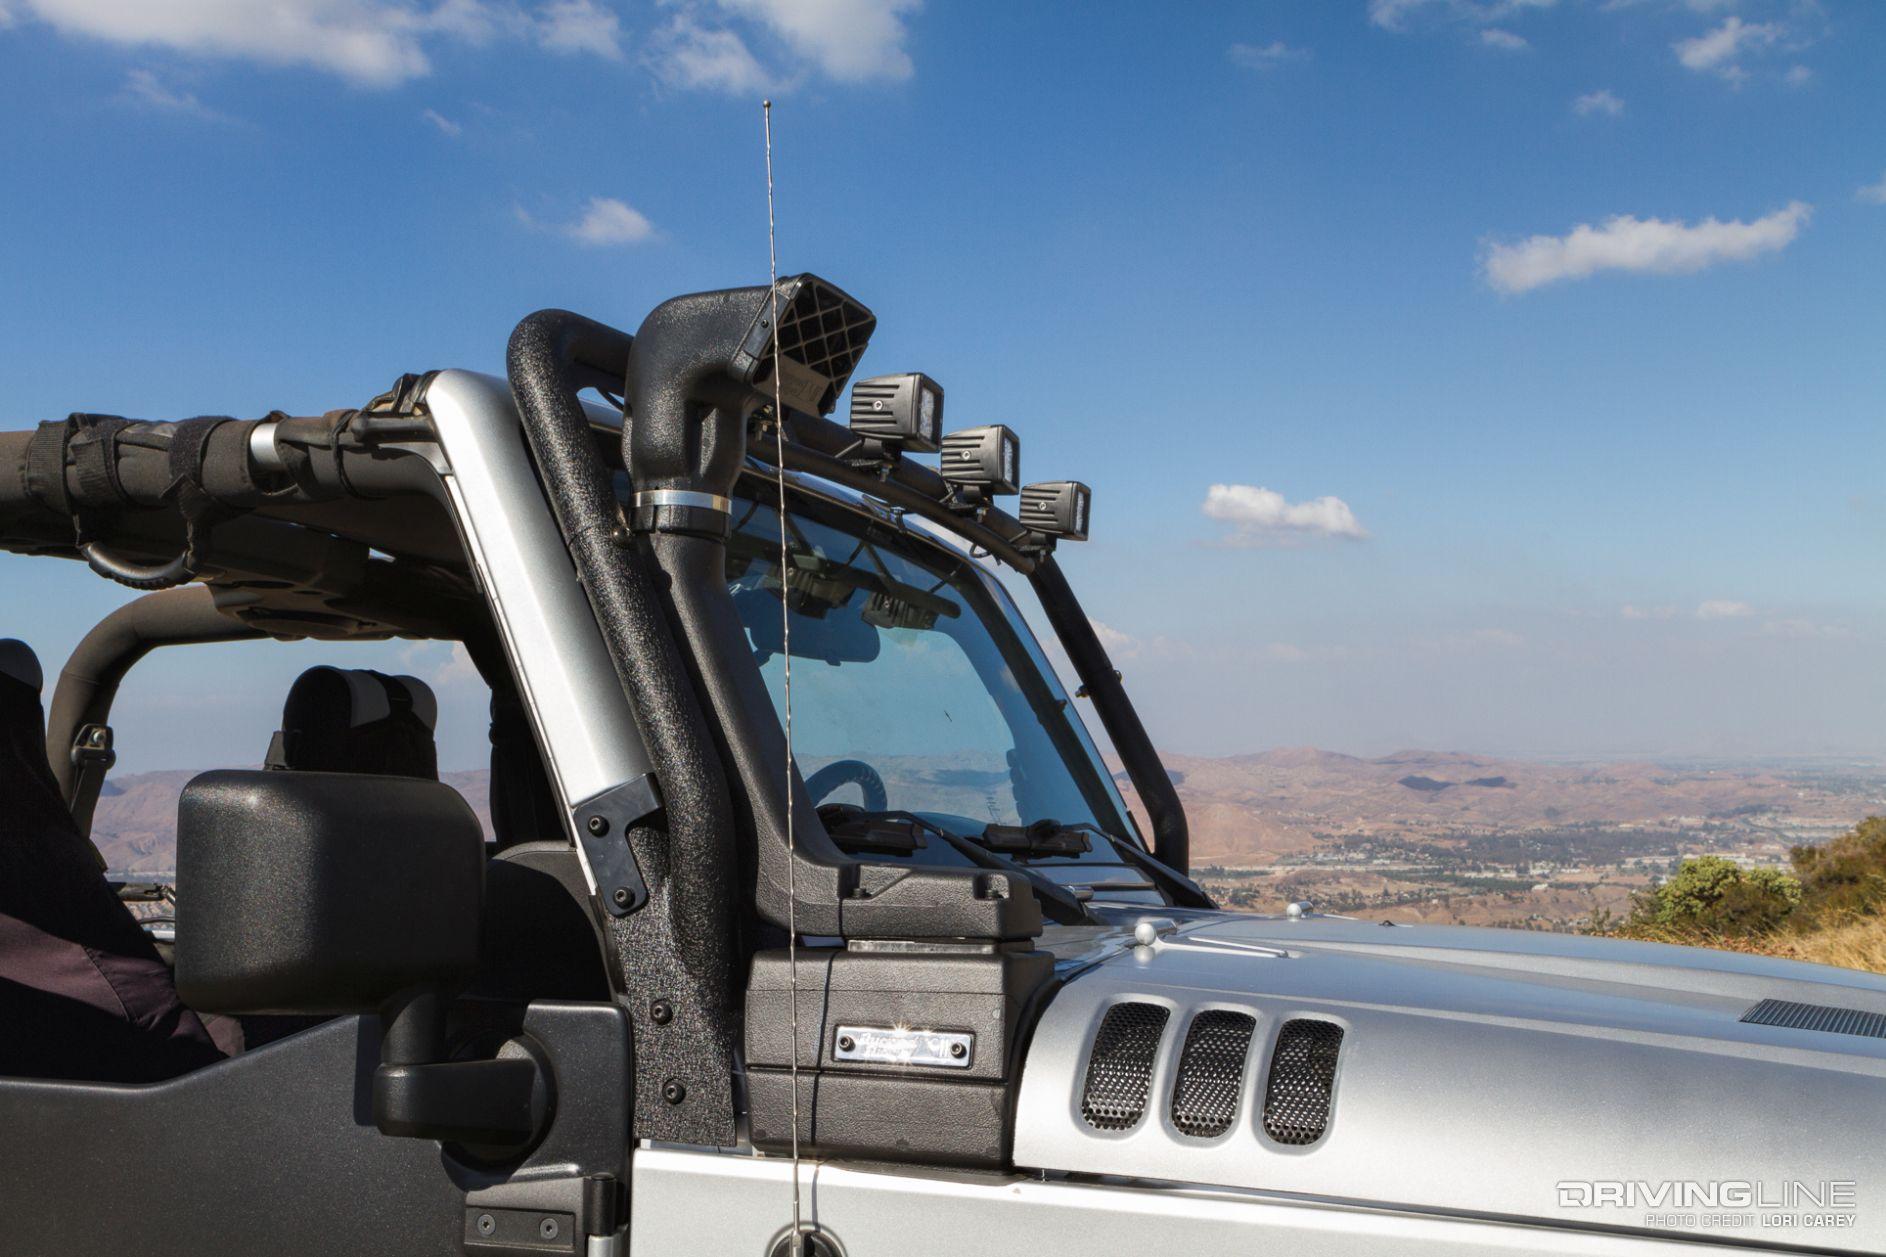 Jeep Wrangler Jk Snorkel Review Drivingline